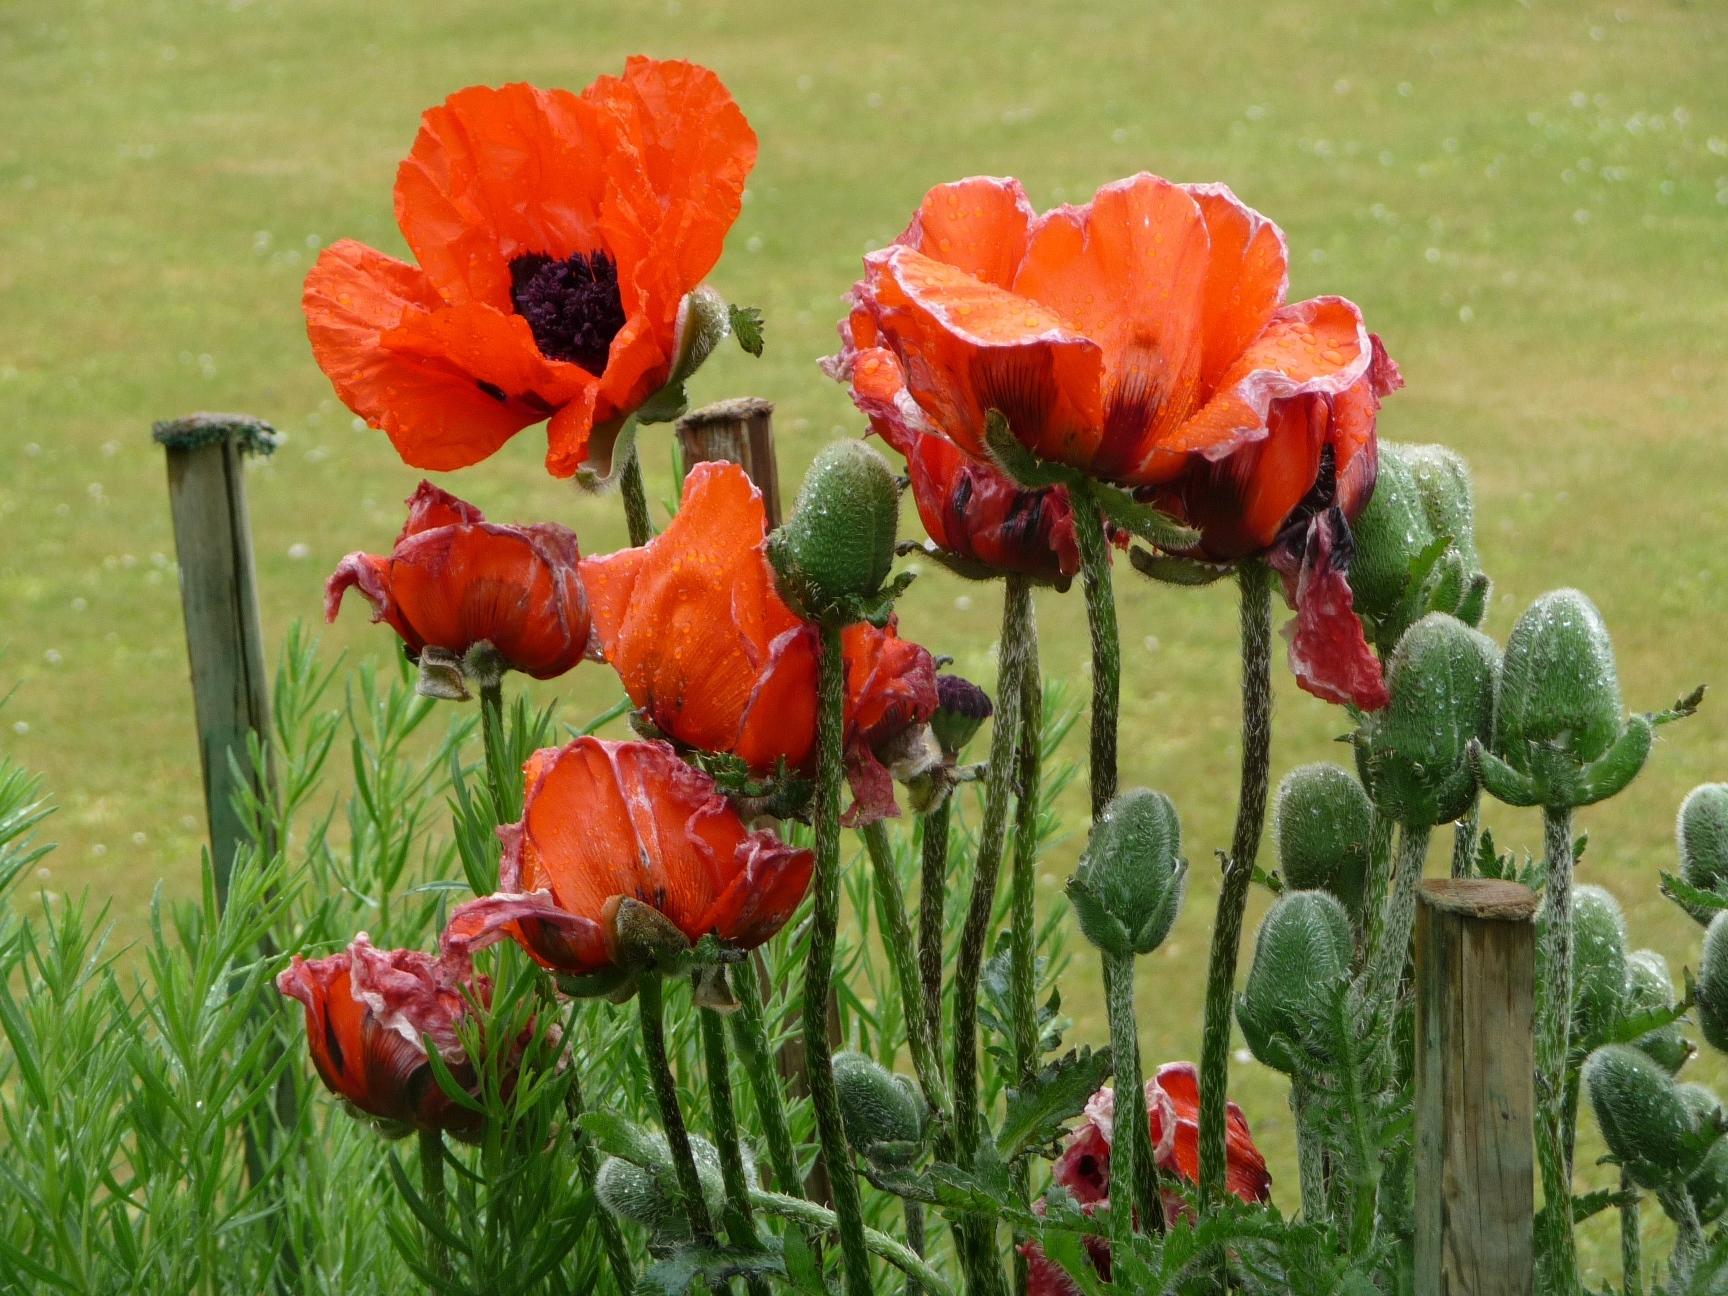 Poppies at Botanics